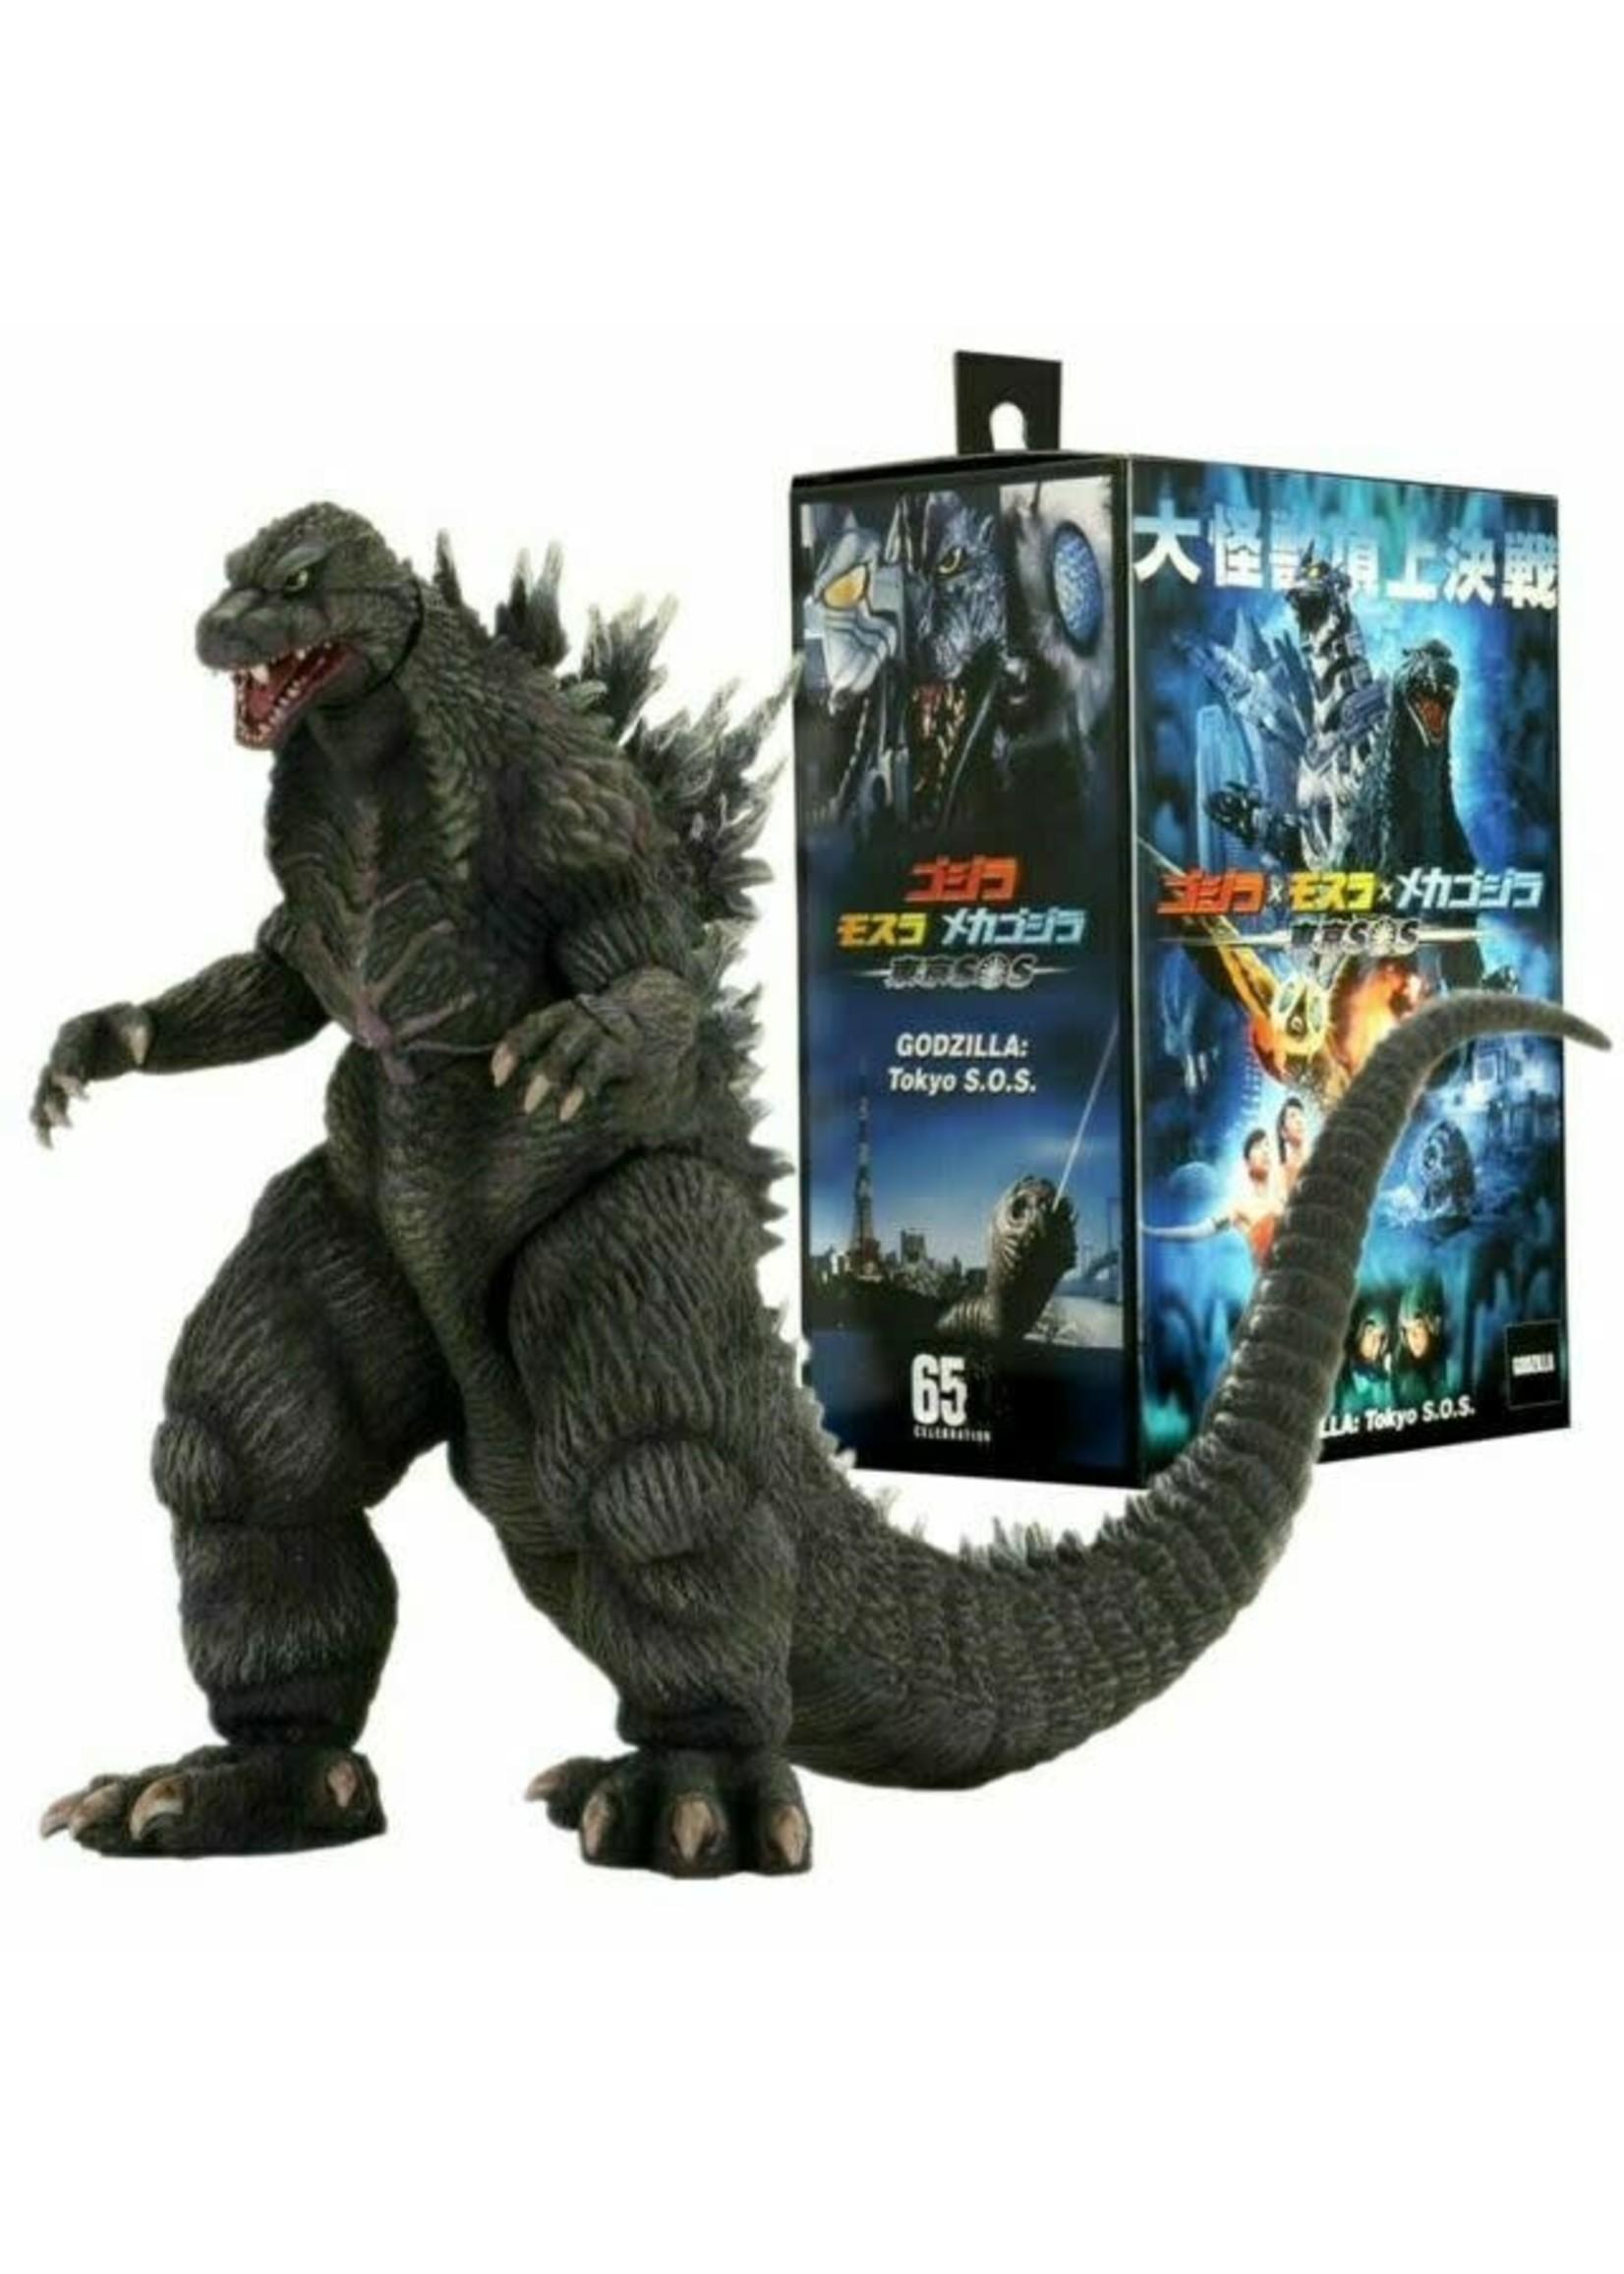 Neca Godzilla Tokyo SOS